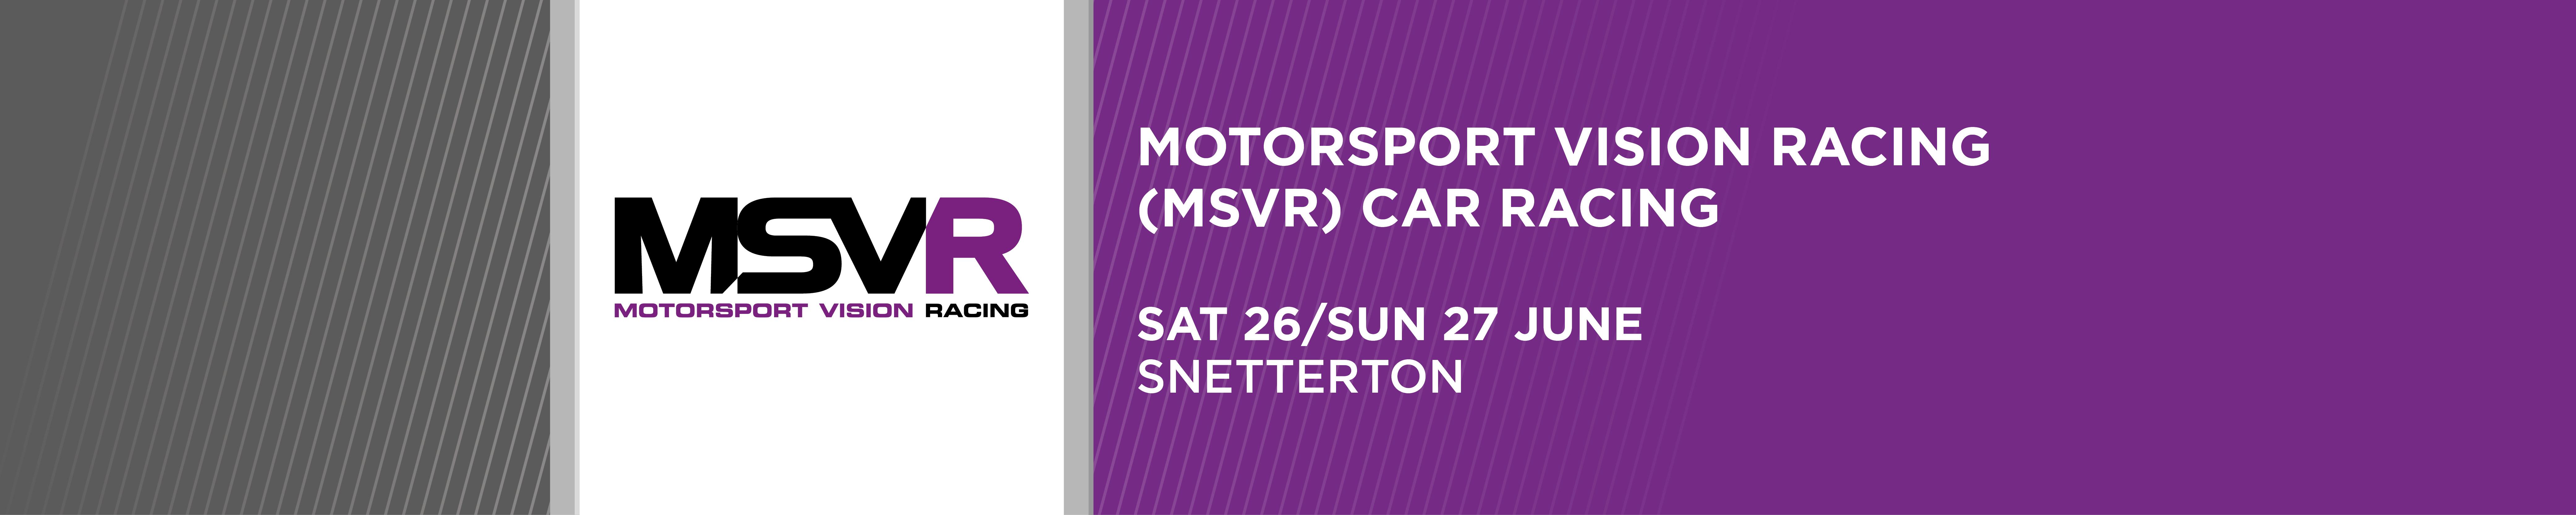 MotorSport Vision Racing and Borough 19 Motor Club